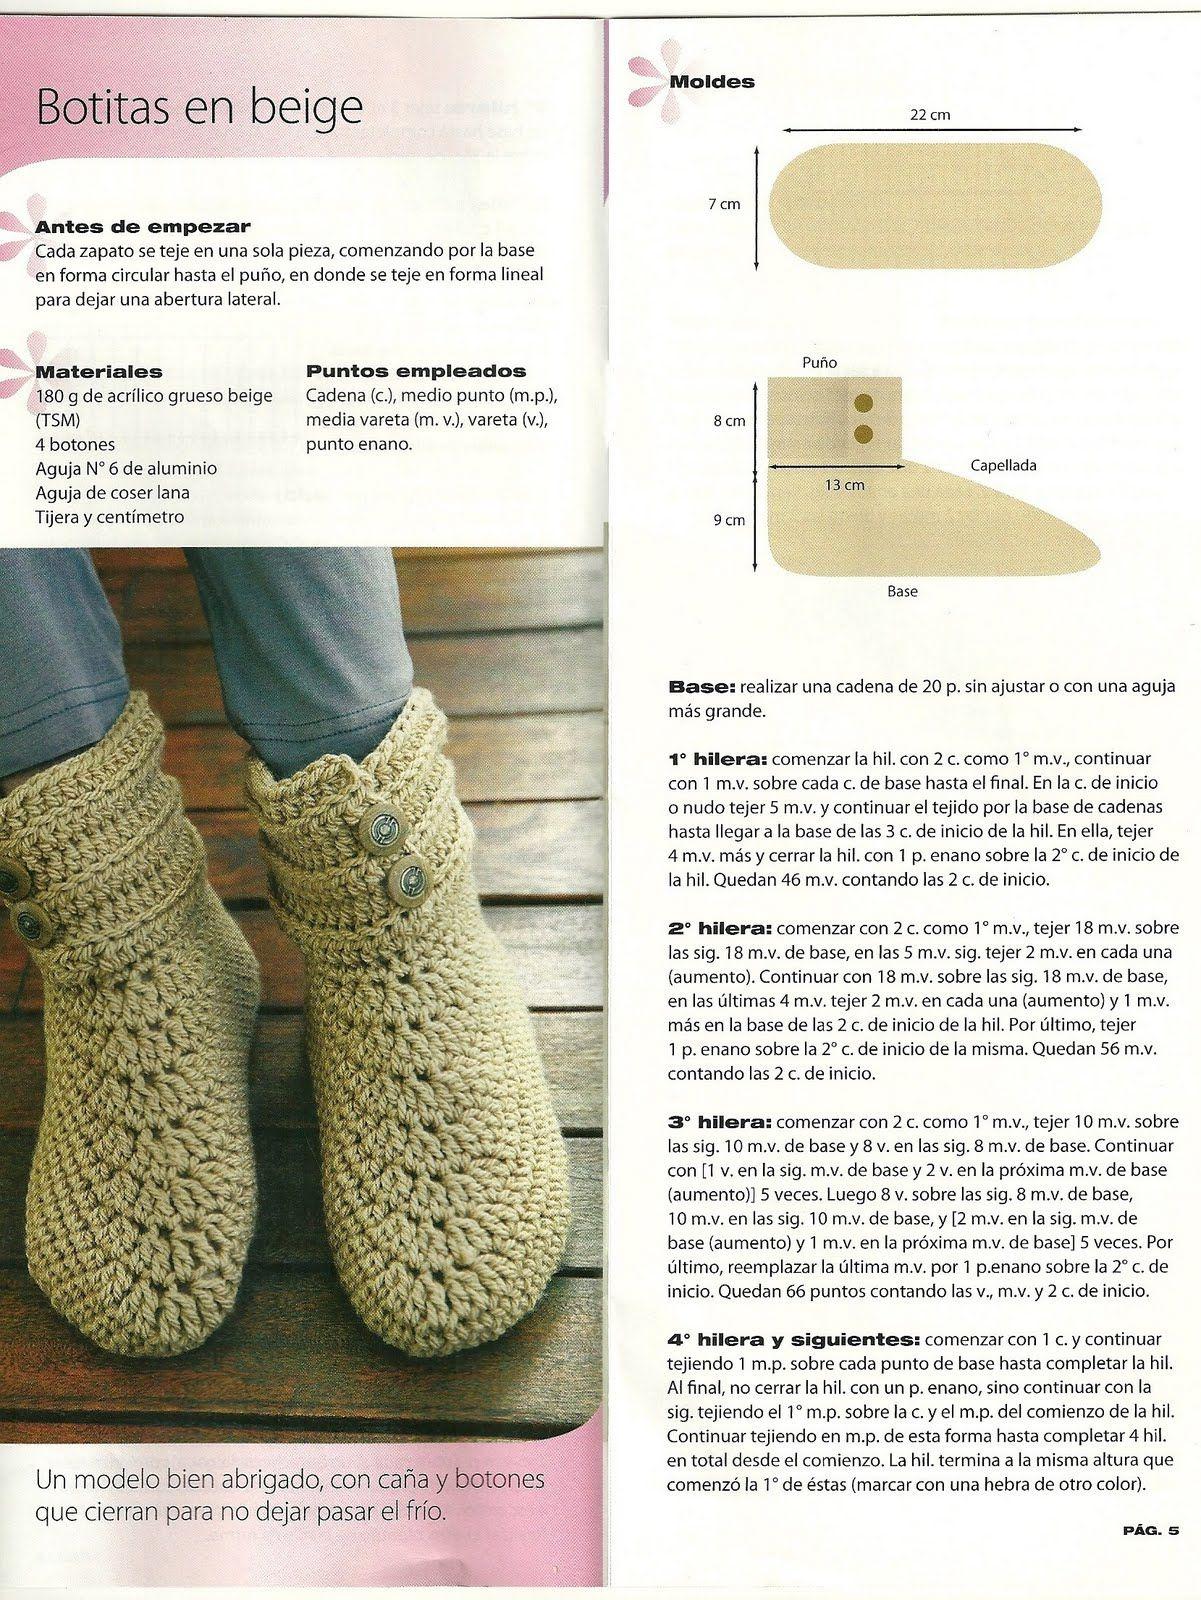 patrones de botas a crochet - Buscar con Google | shoes crochet ...